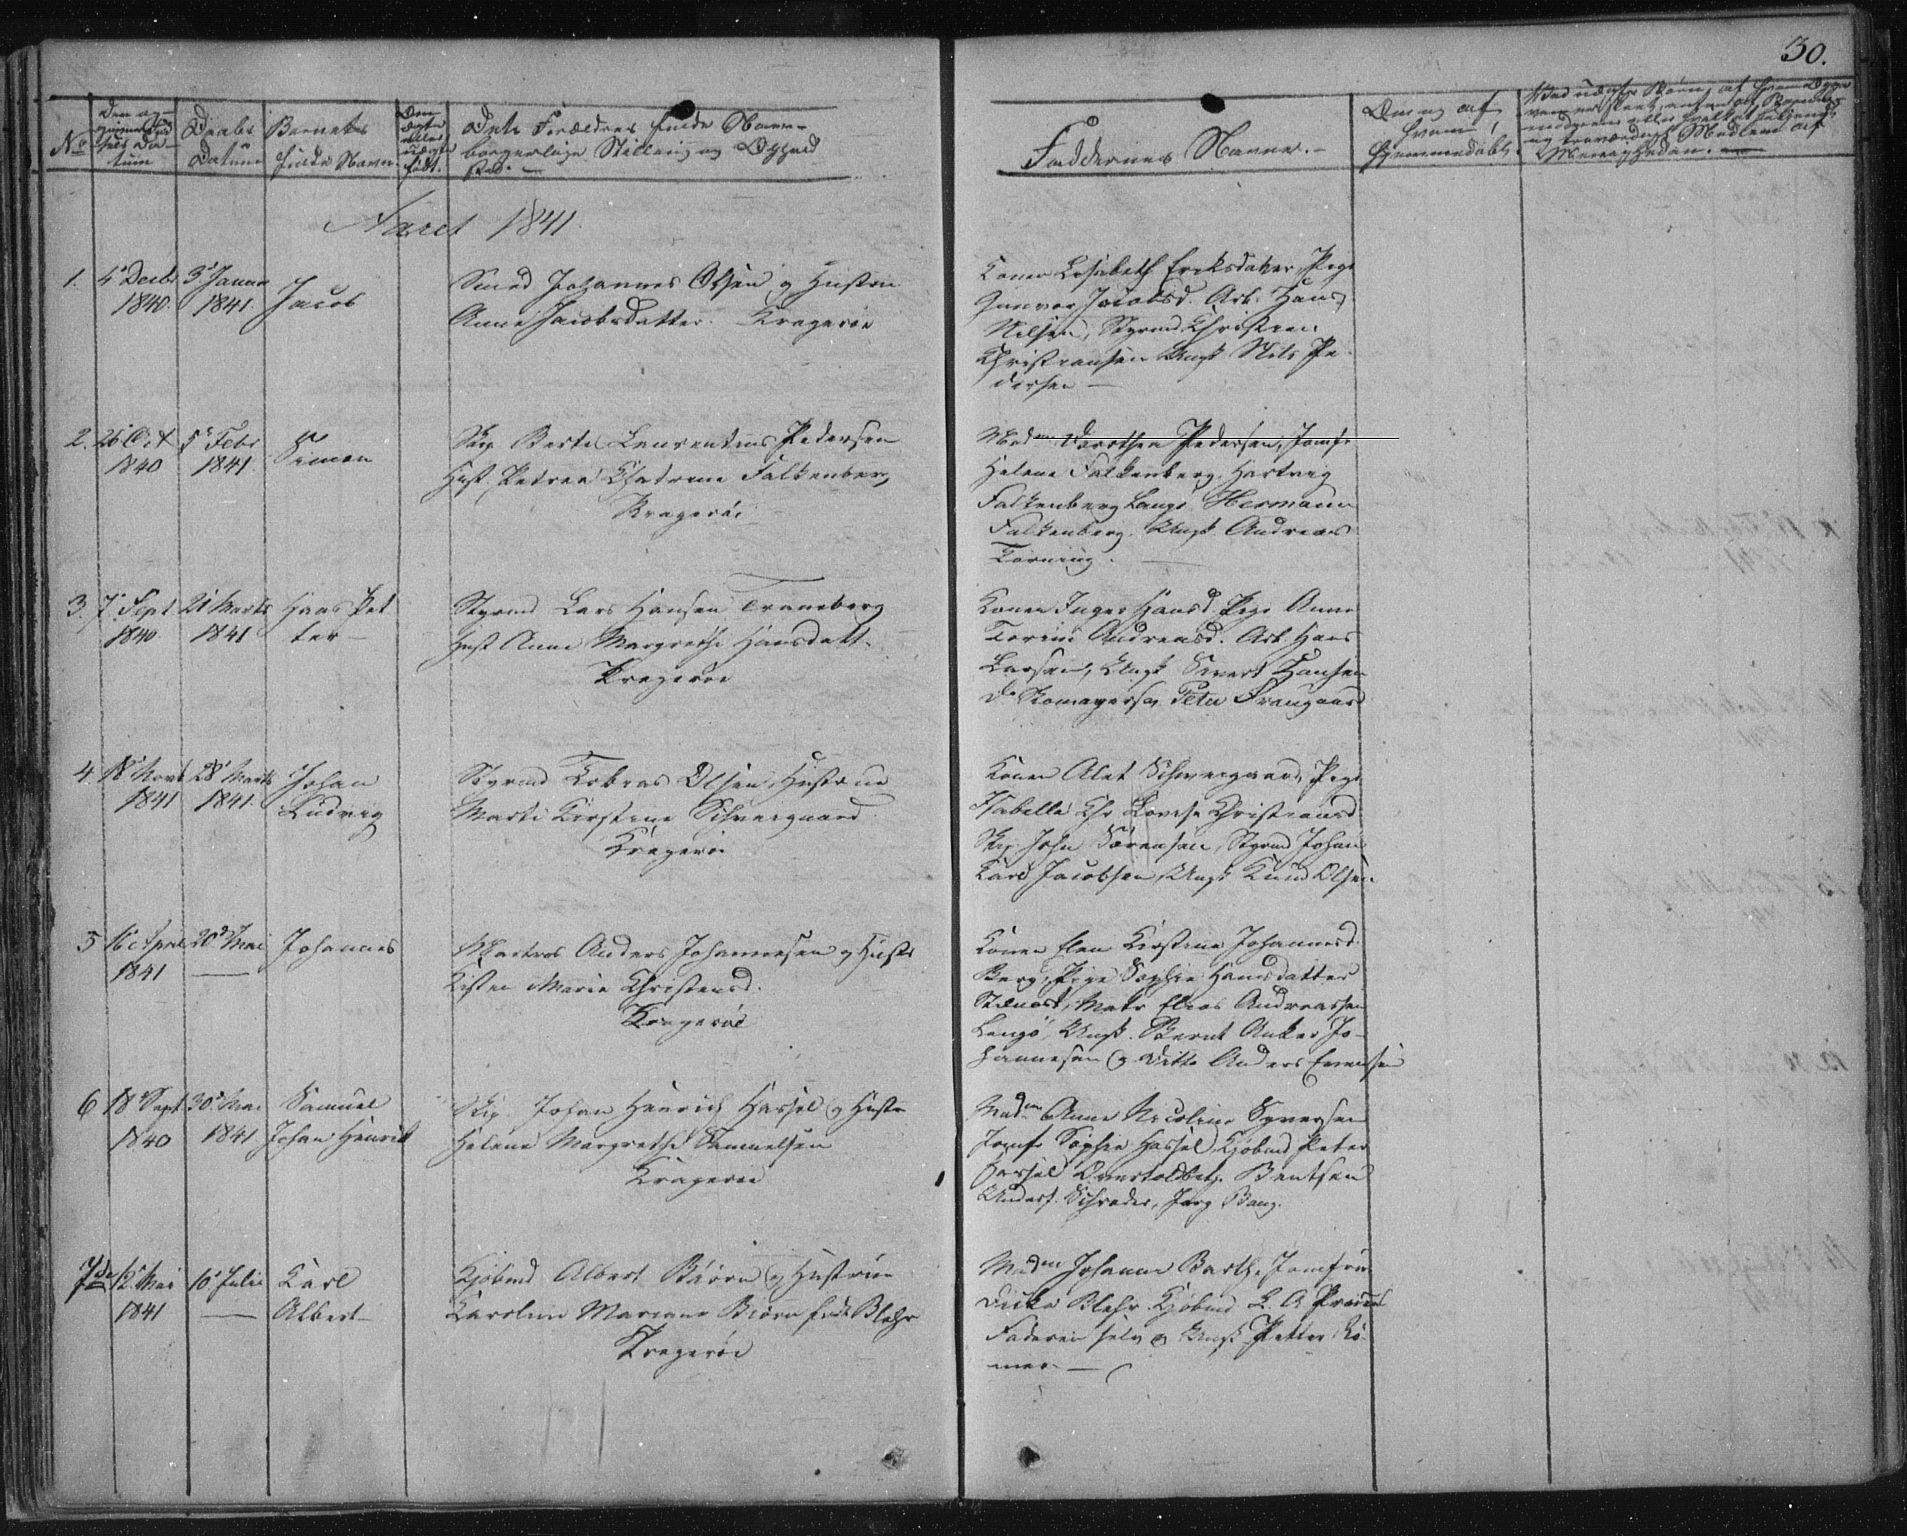 SAKO, Kragerø kirkebøker, F/Fa/L0005: Ministerialbok nr. 5, 1832-1847, s. 30